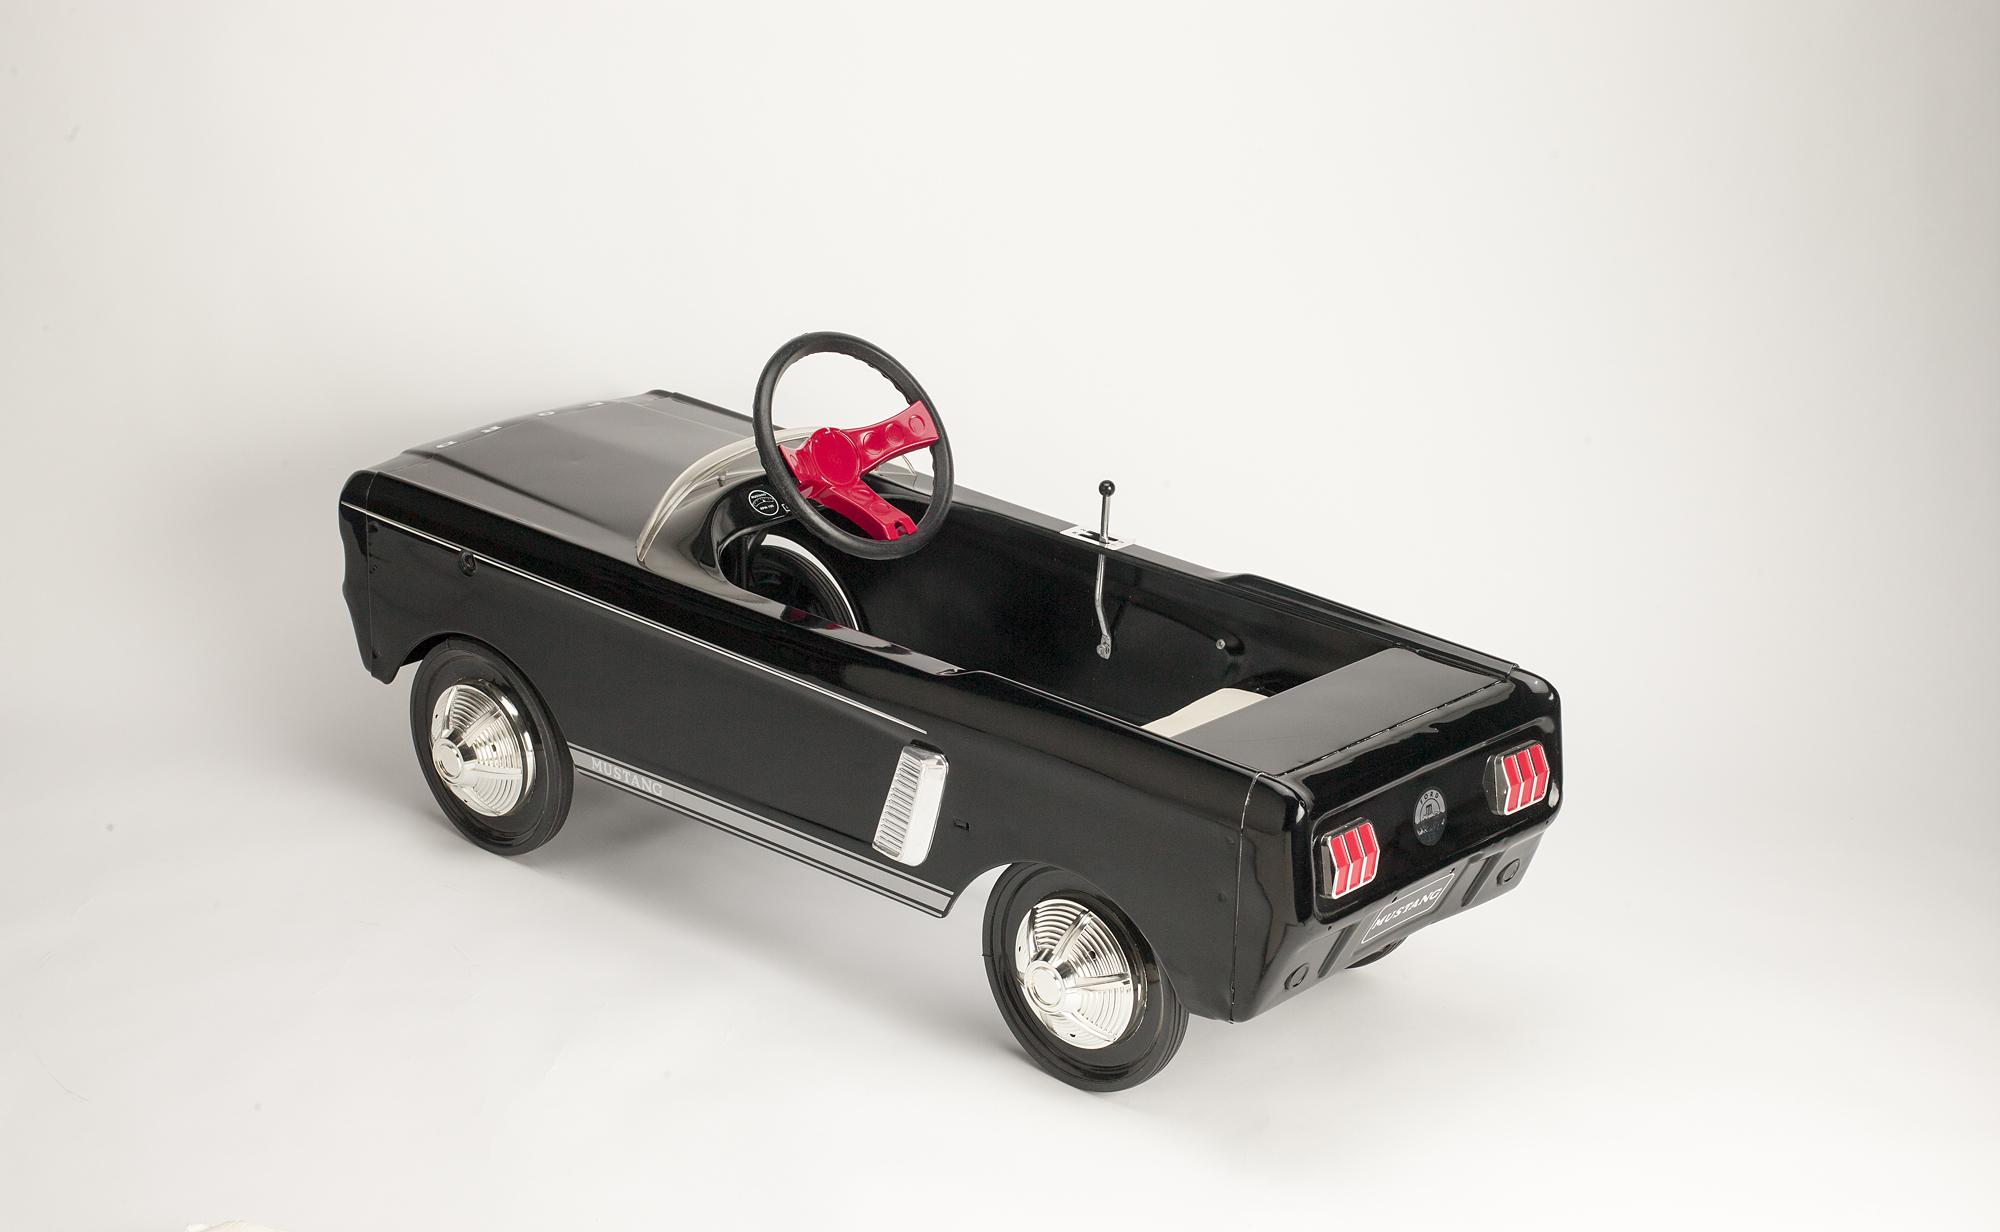 Apologise, 1960s midget car photo remarkable, rather